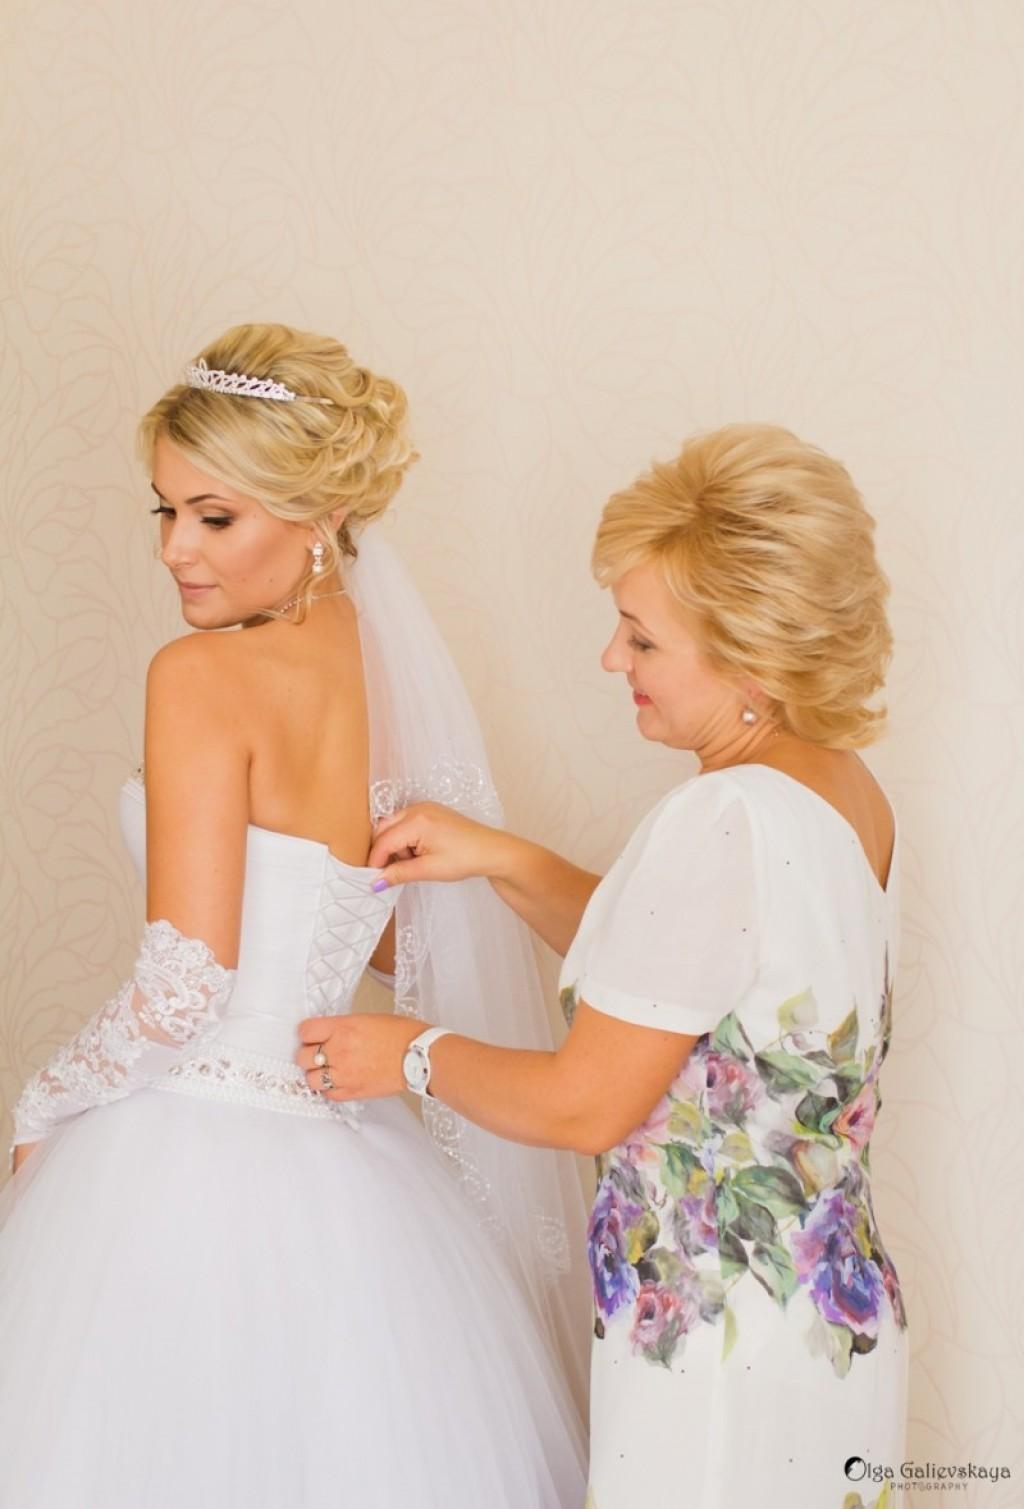 Мама подготавливает невесту